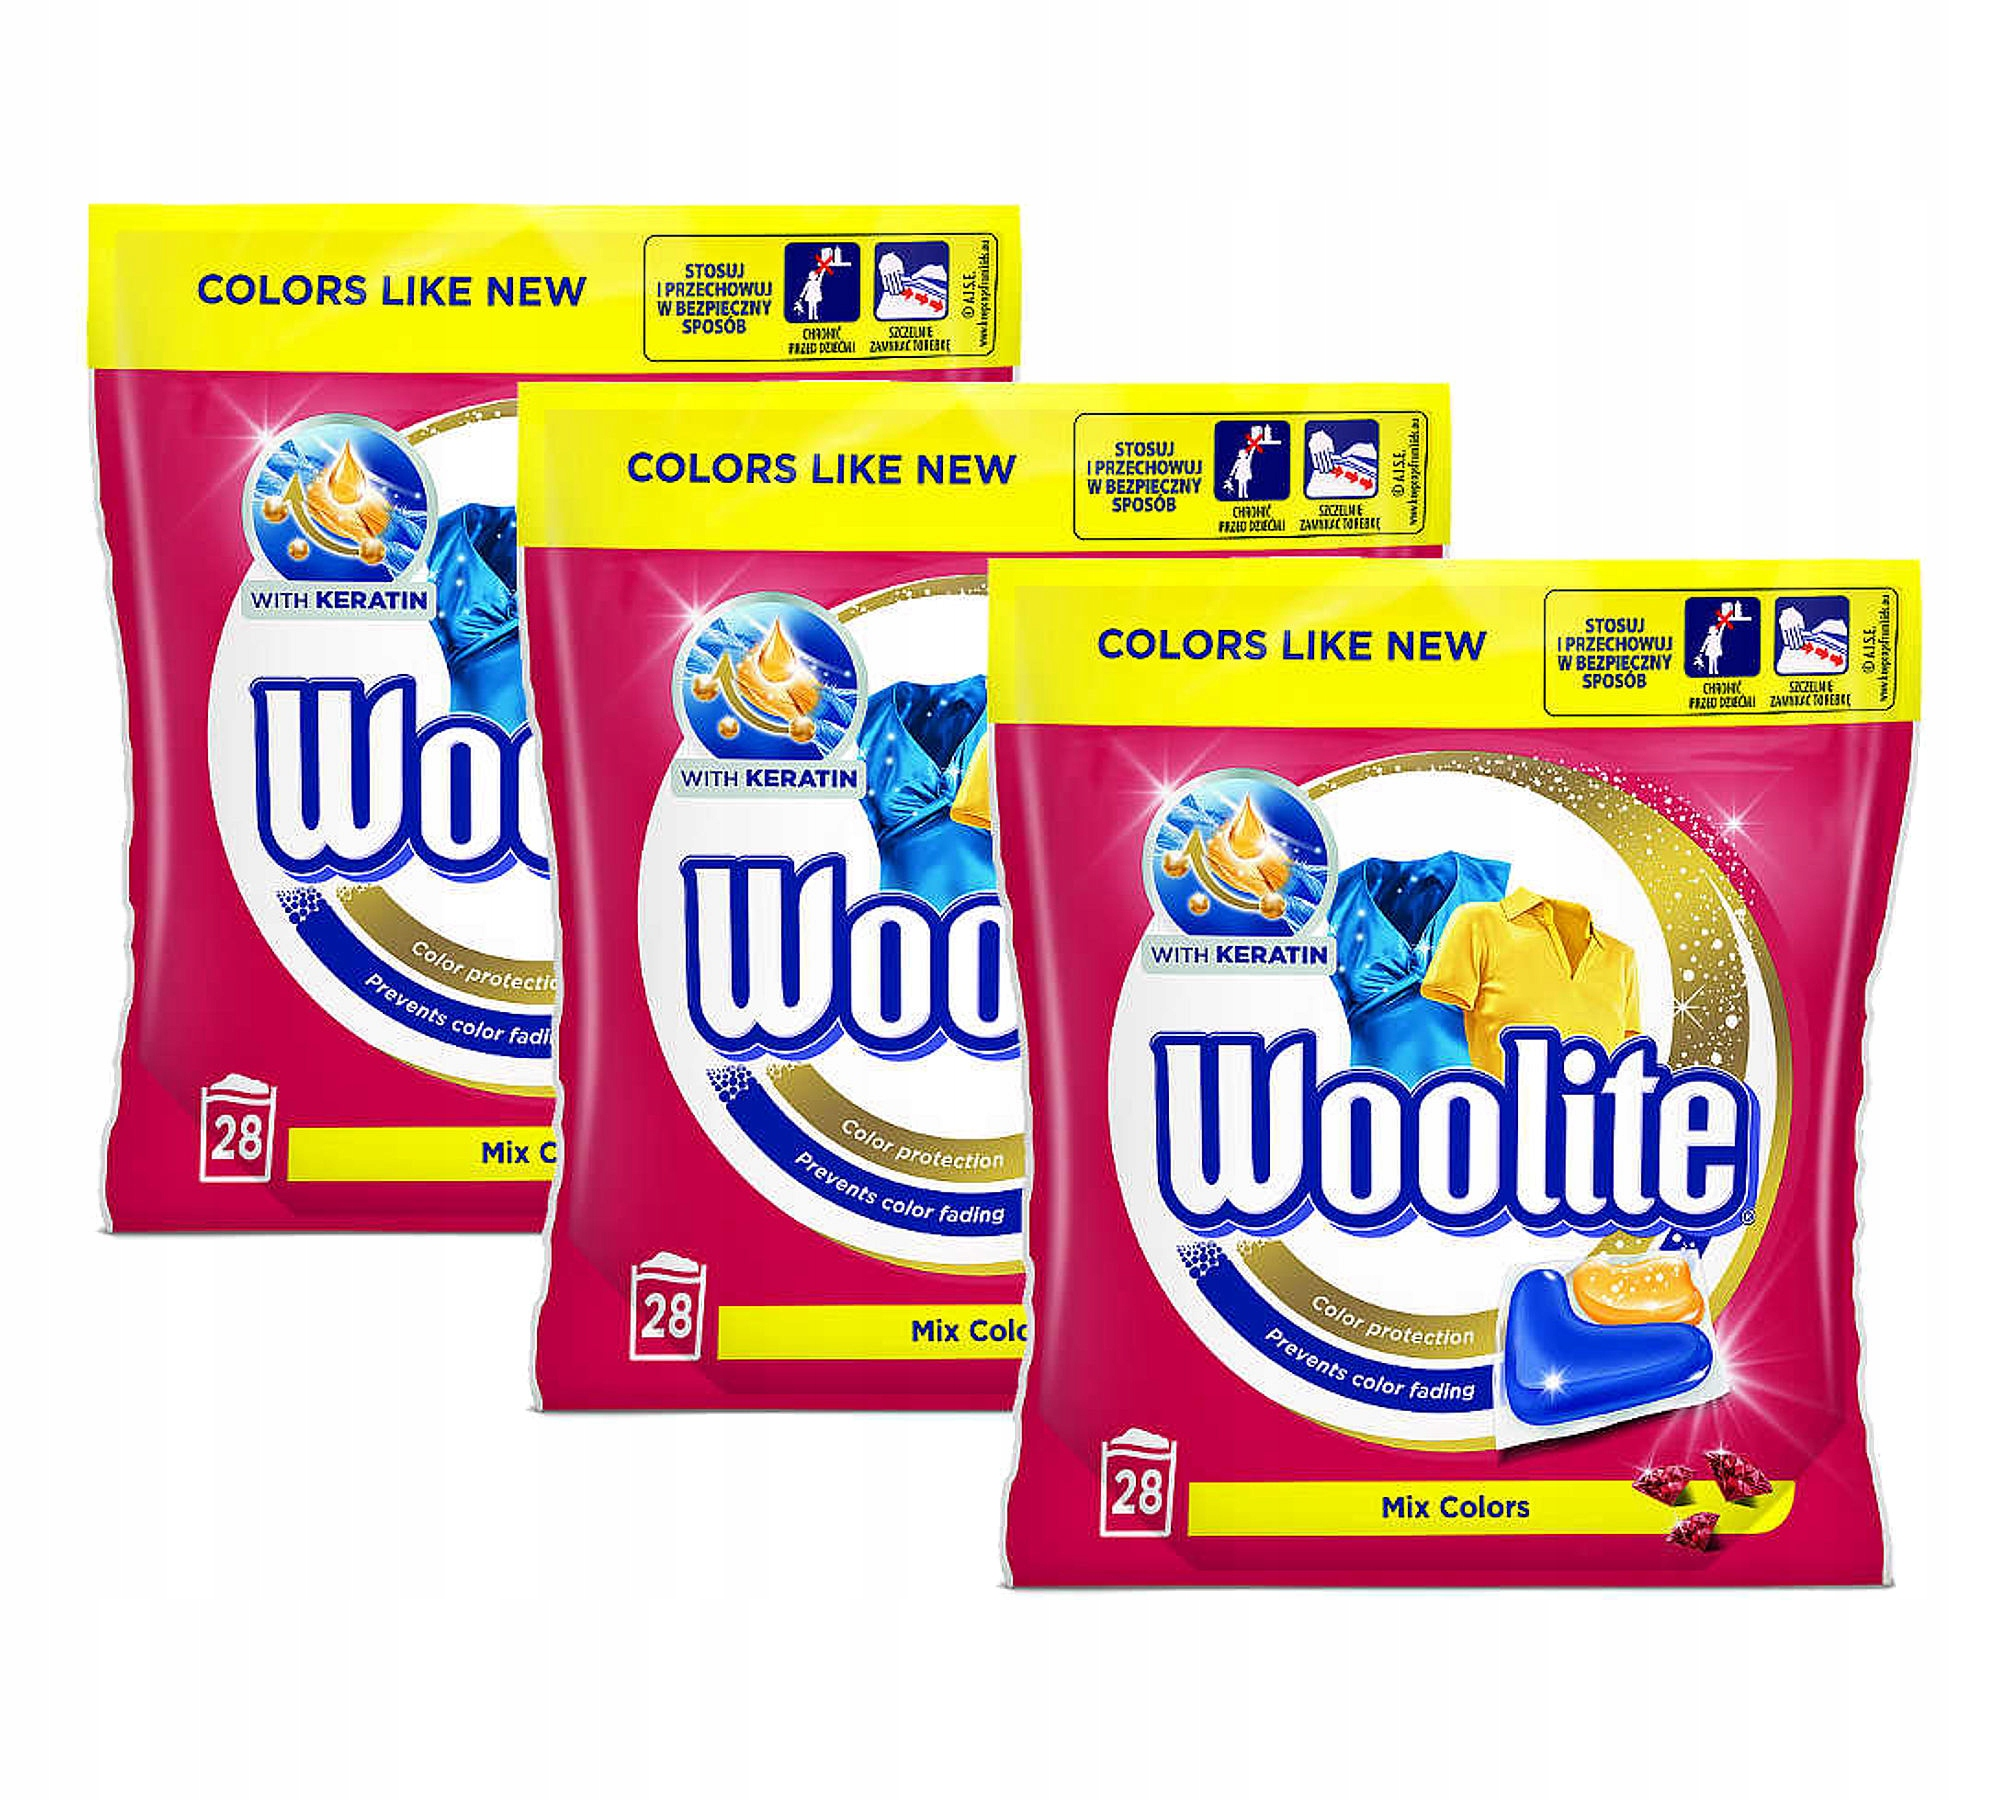 Woolite Mix Farby Kapsule na Pranie Color 84szt